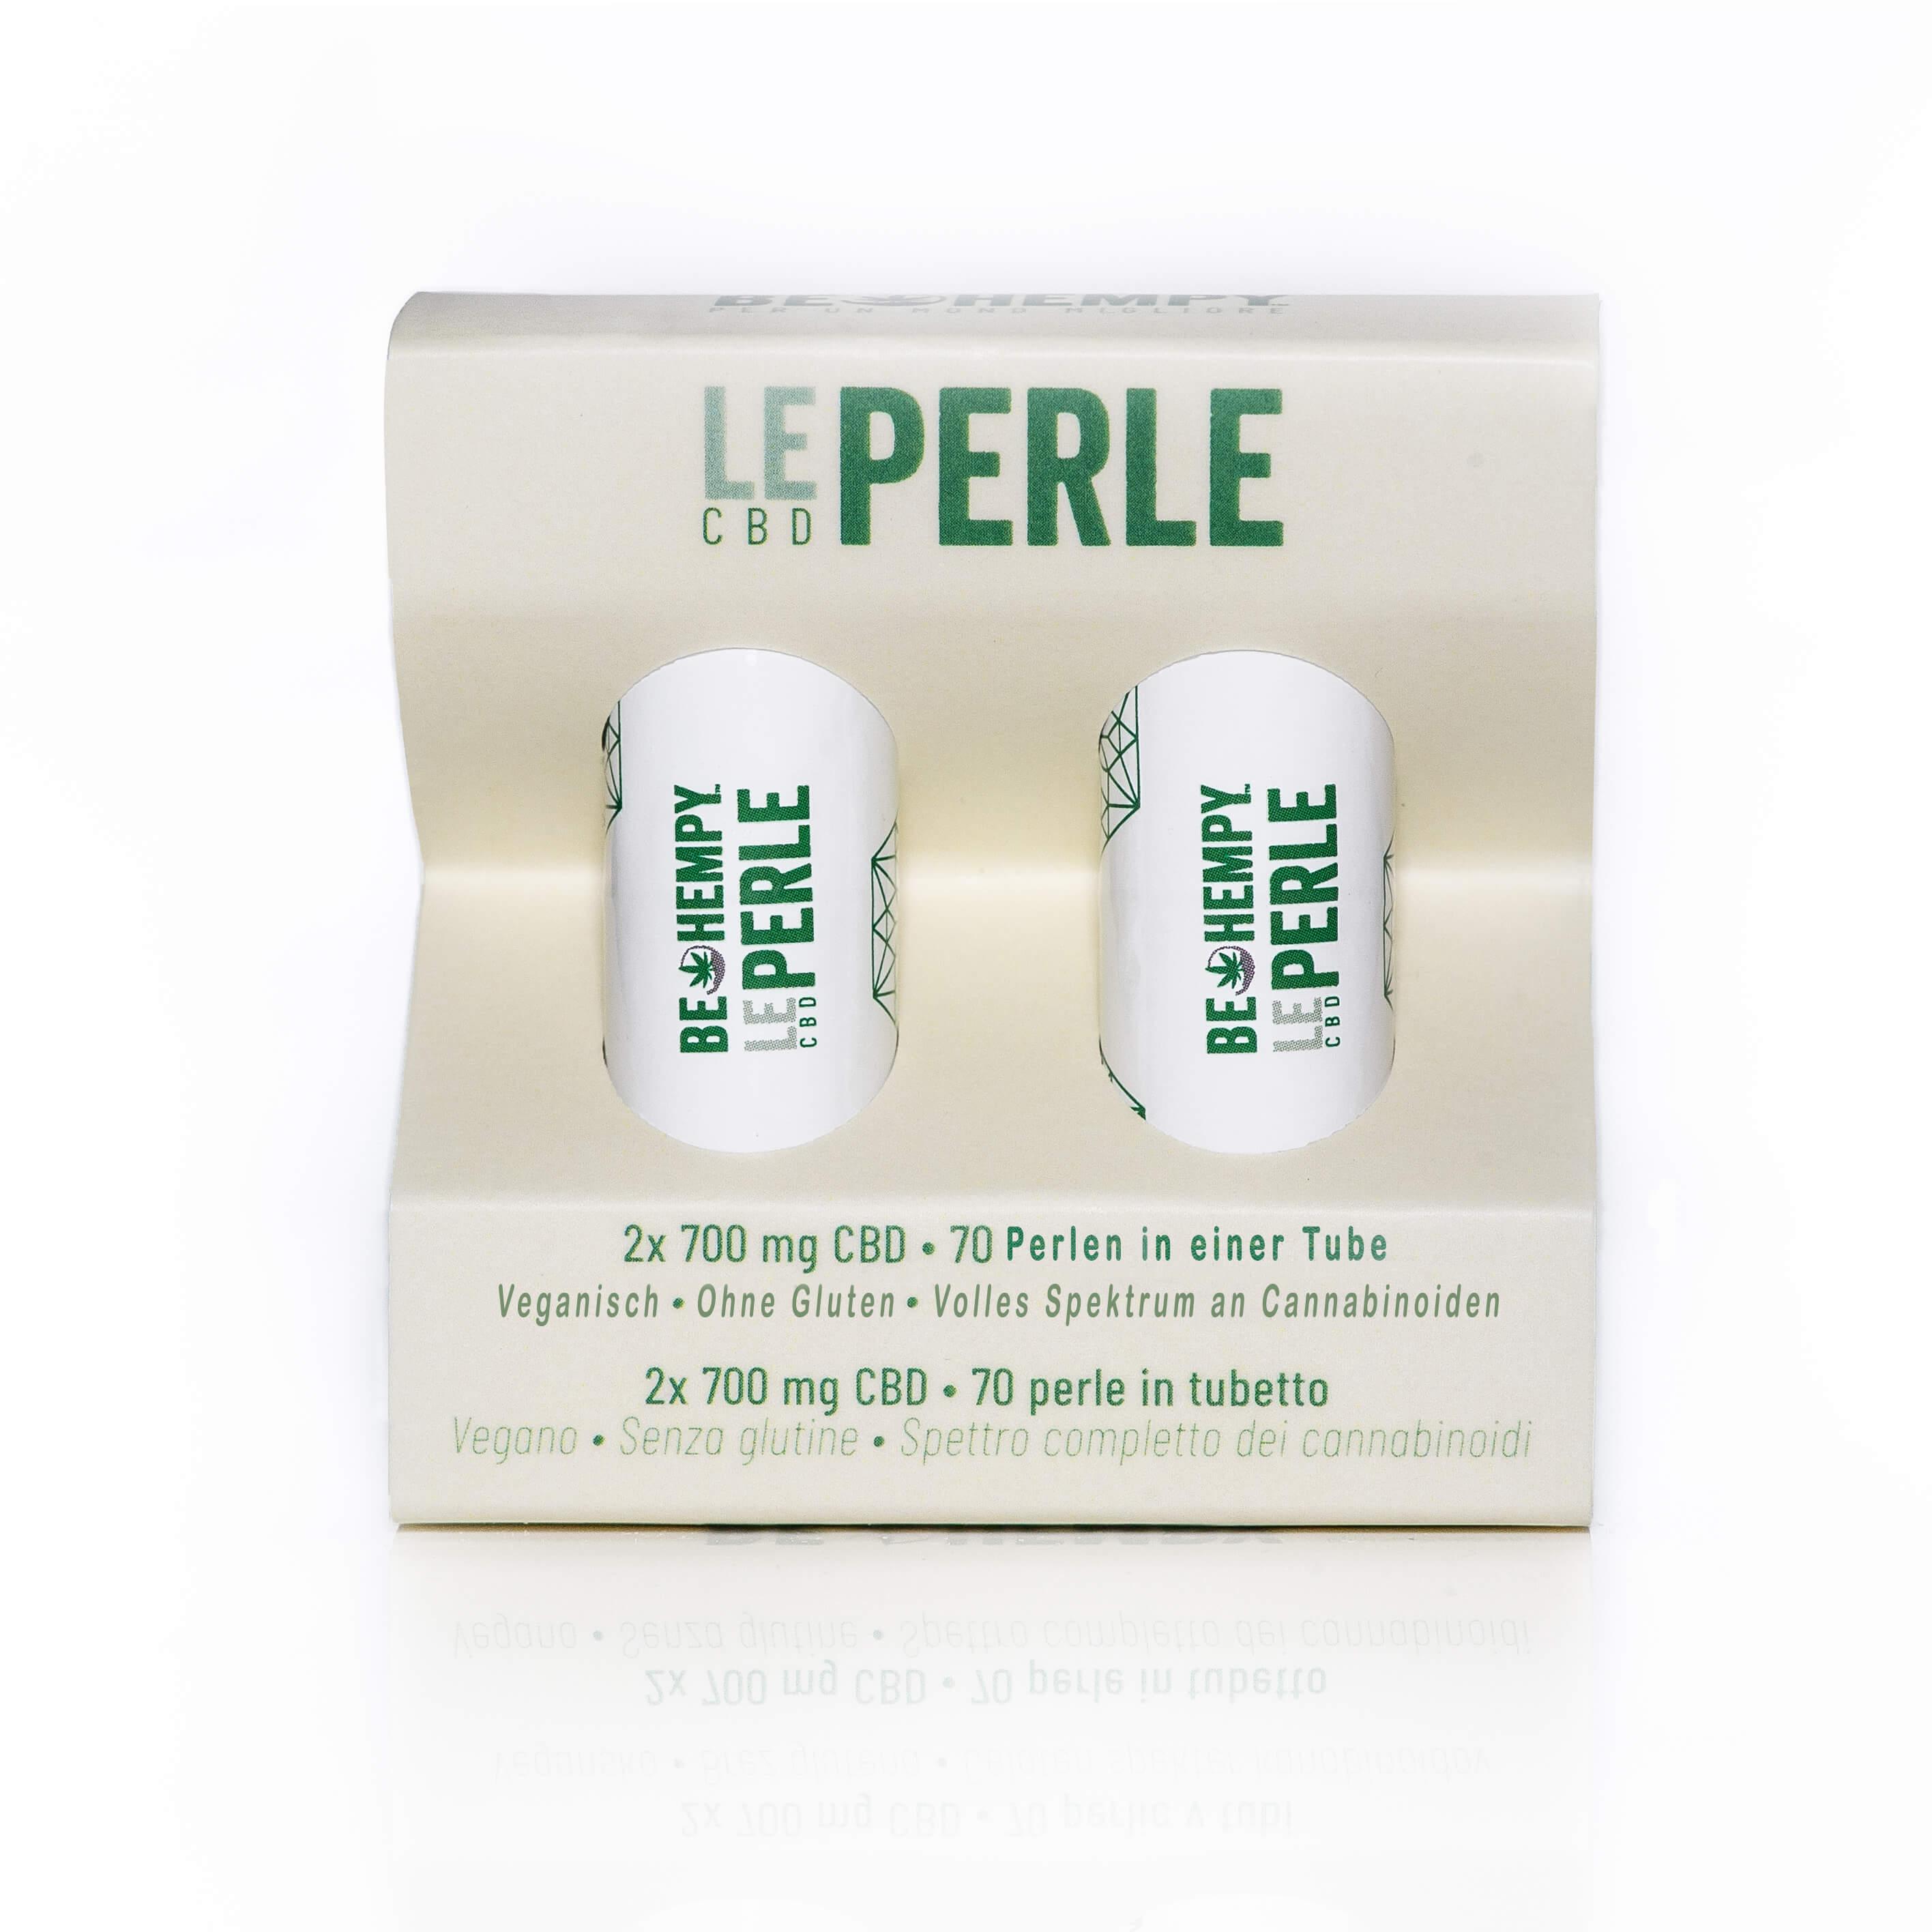 CBD Globuli - Le Perle, 2x 700 mg CBD Tube